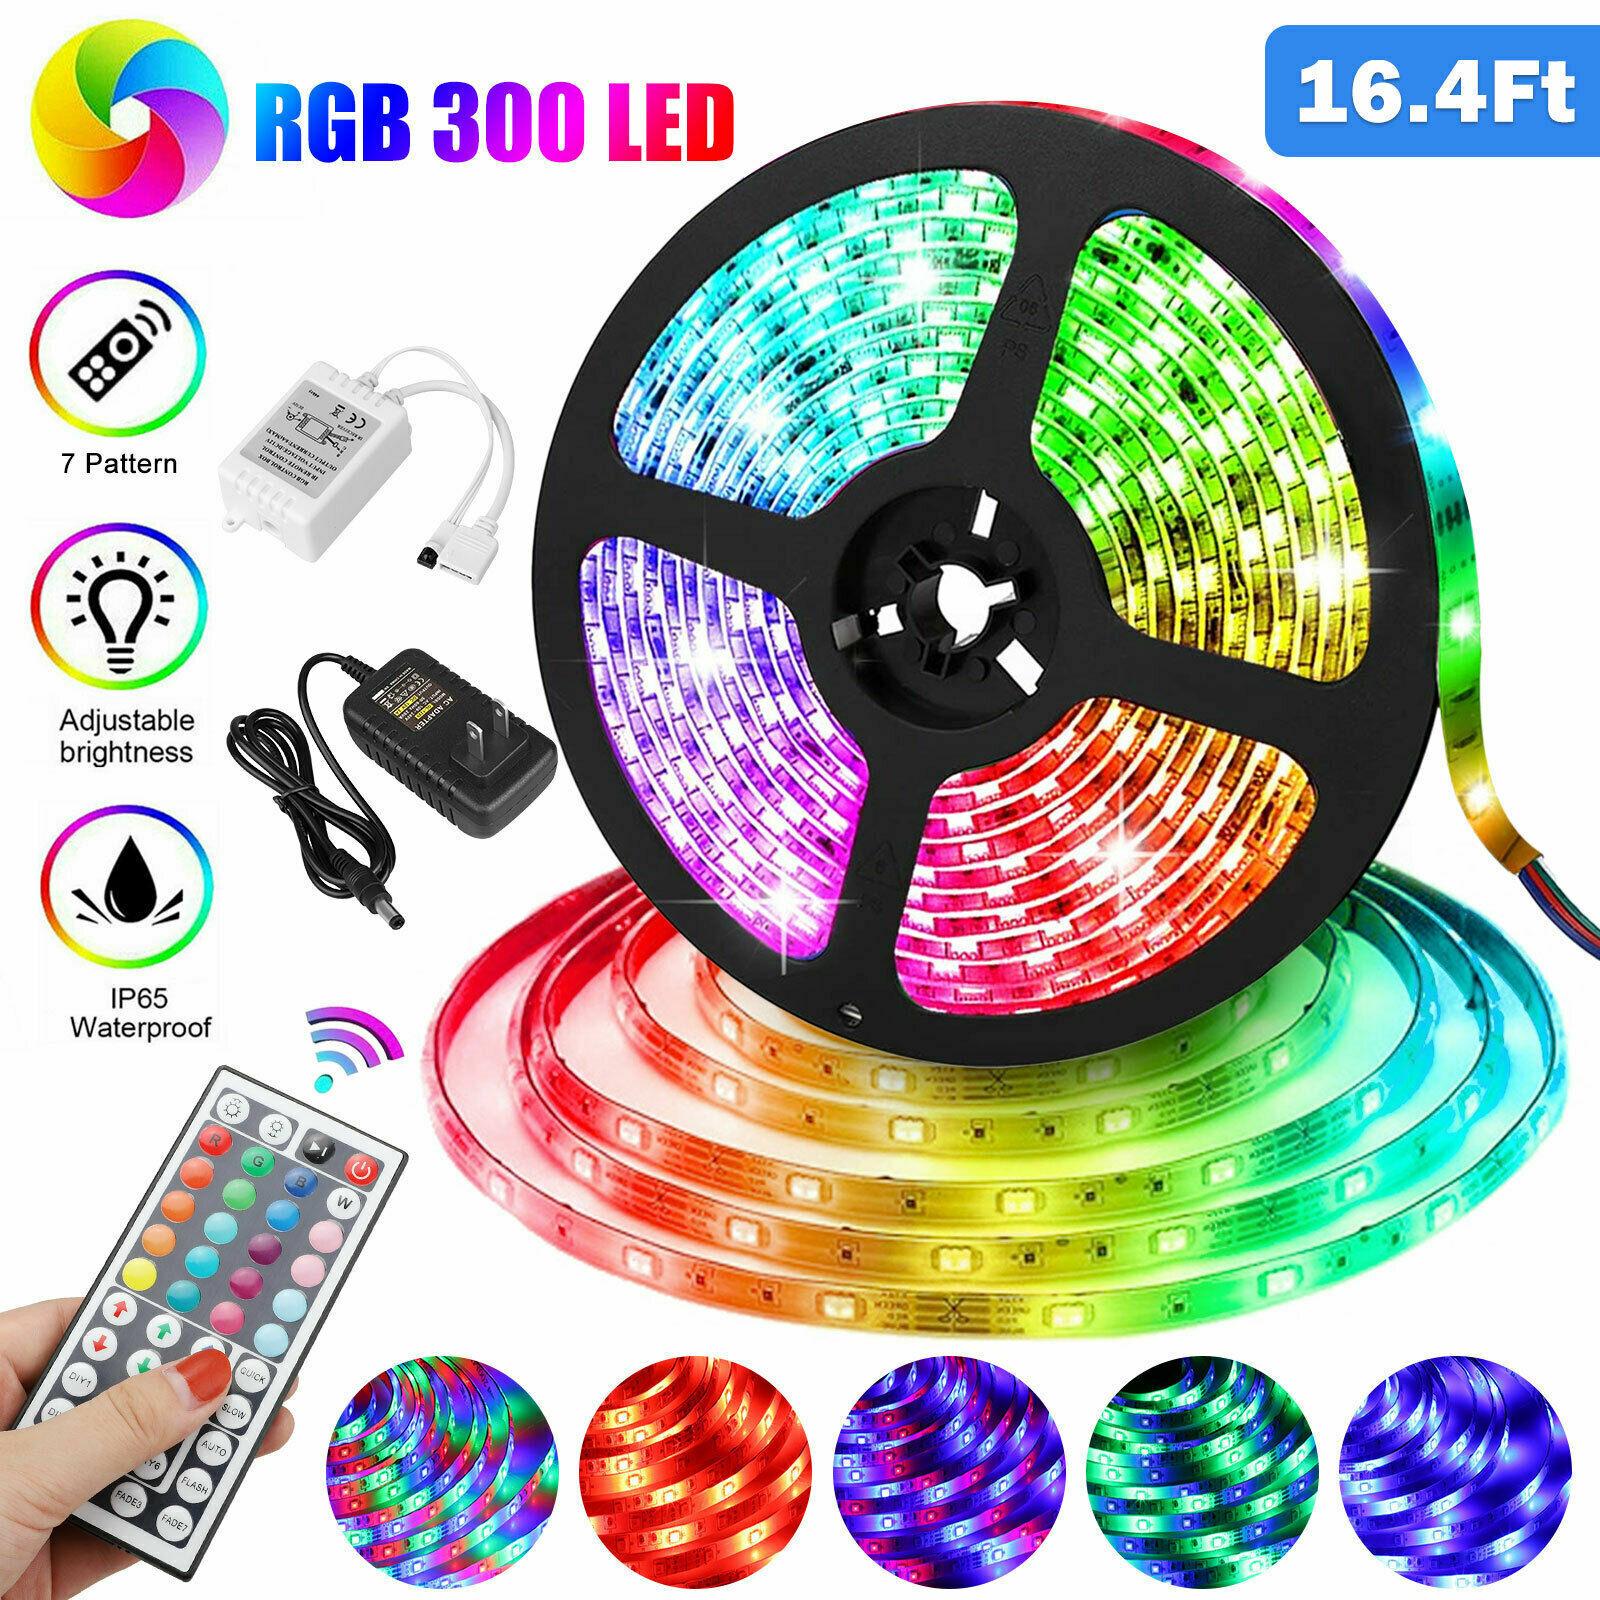 RGB 5M 16.4ft Waterproof 3528 SMD 300 LED Flexible Light Strip 12V+44 Key Remote Home & Garden